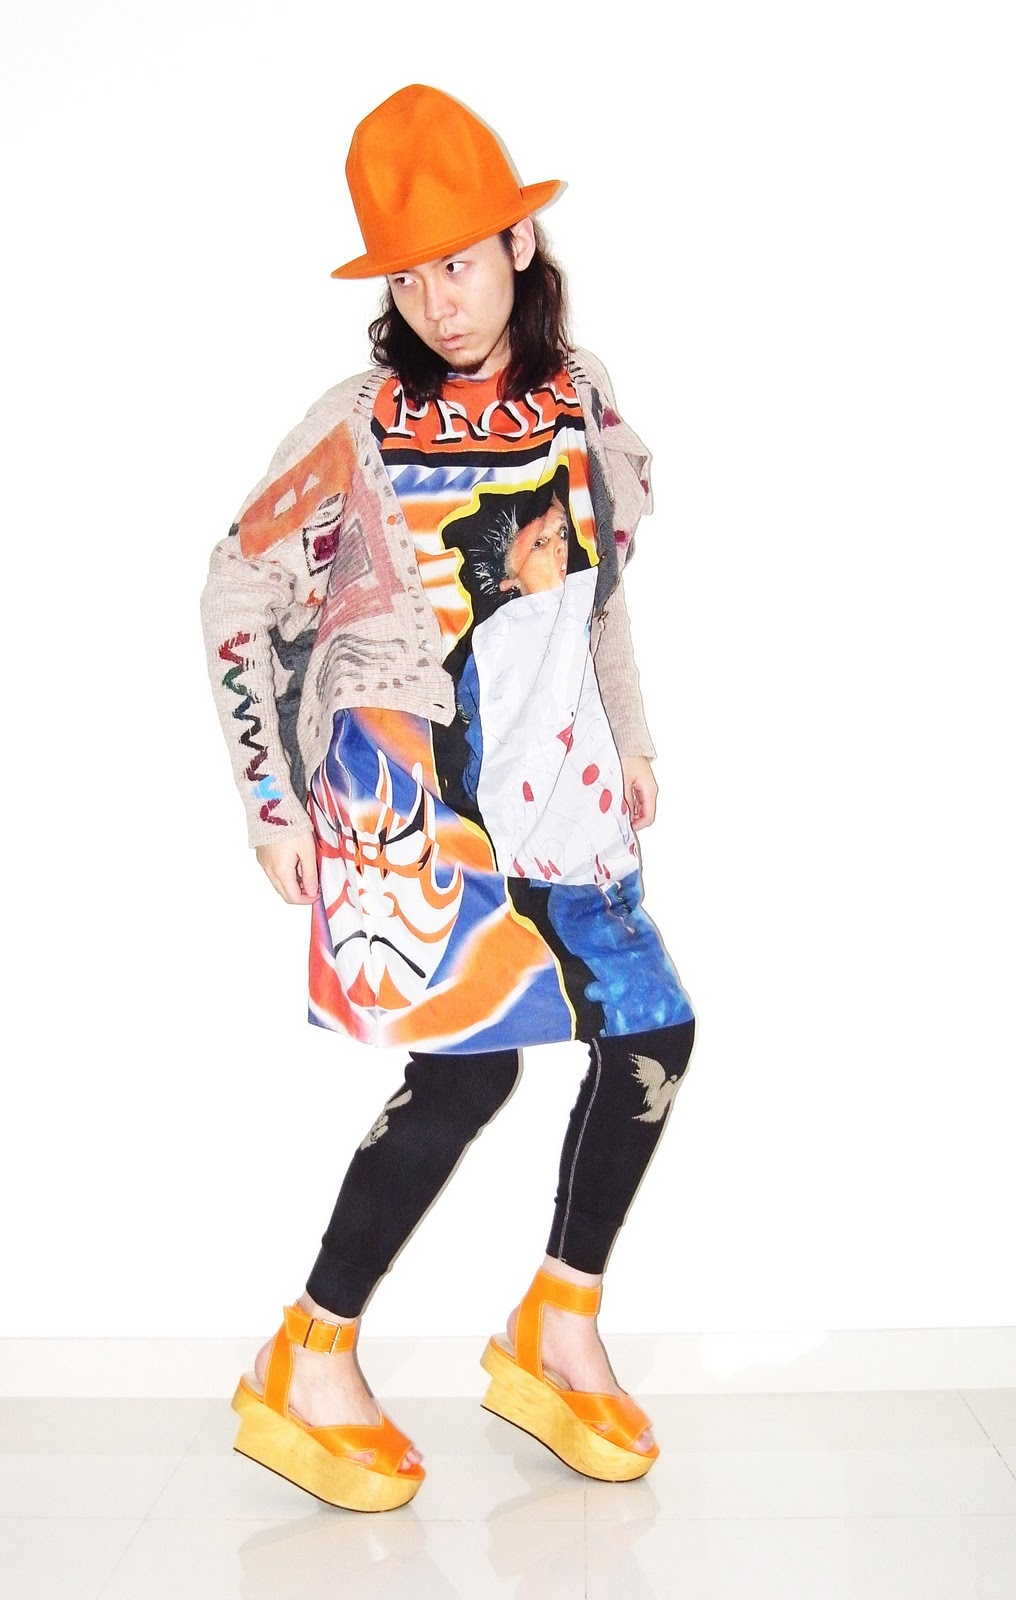 3b71f7f2c0a1 Orange Vivienne Westwood Rocking Horse Slave Shoes. Mountain Hat - World s  End Vivienne Westwood. Black Top - Sadak. Prodigy Top - Vava Dudu.